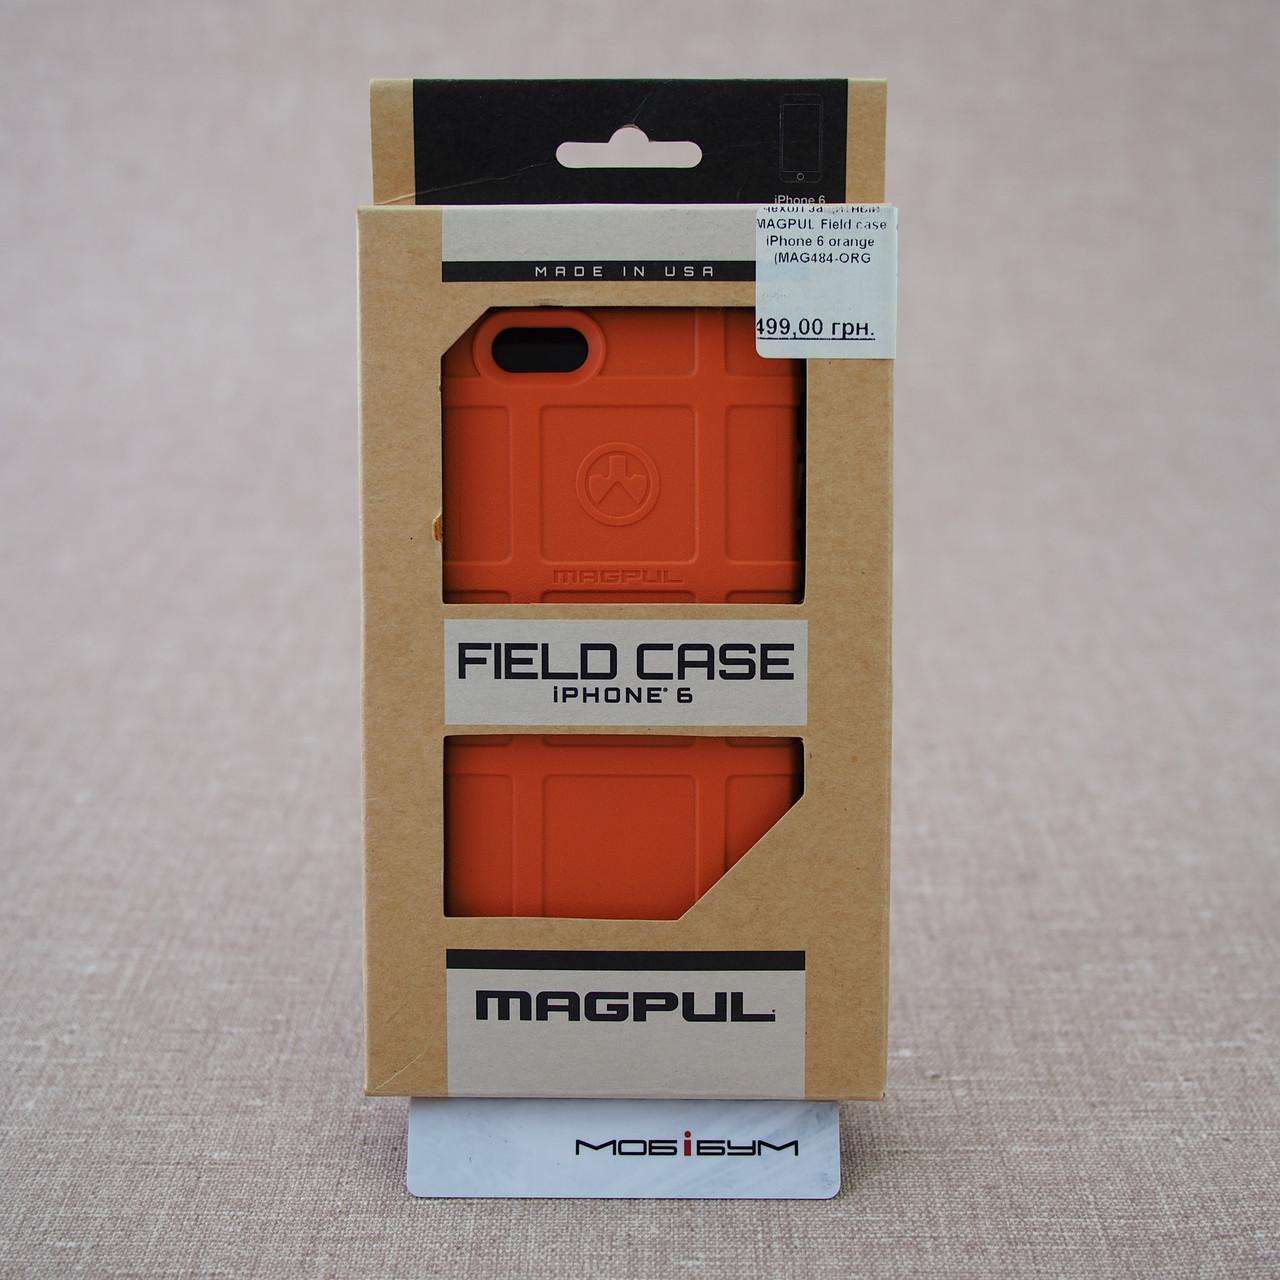 Чехол защитный MAGPUL Field case iPhone 6 orange (MAG484-ORG) EAN/UPC: 840815100089